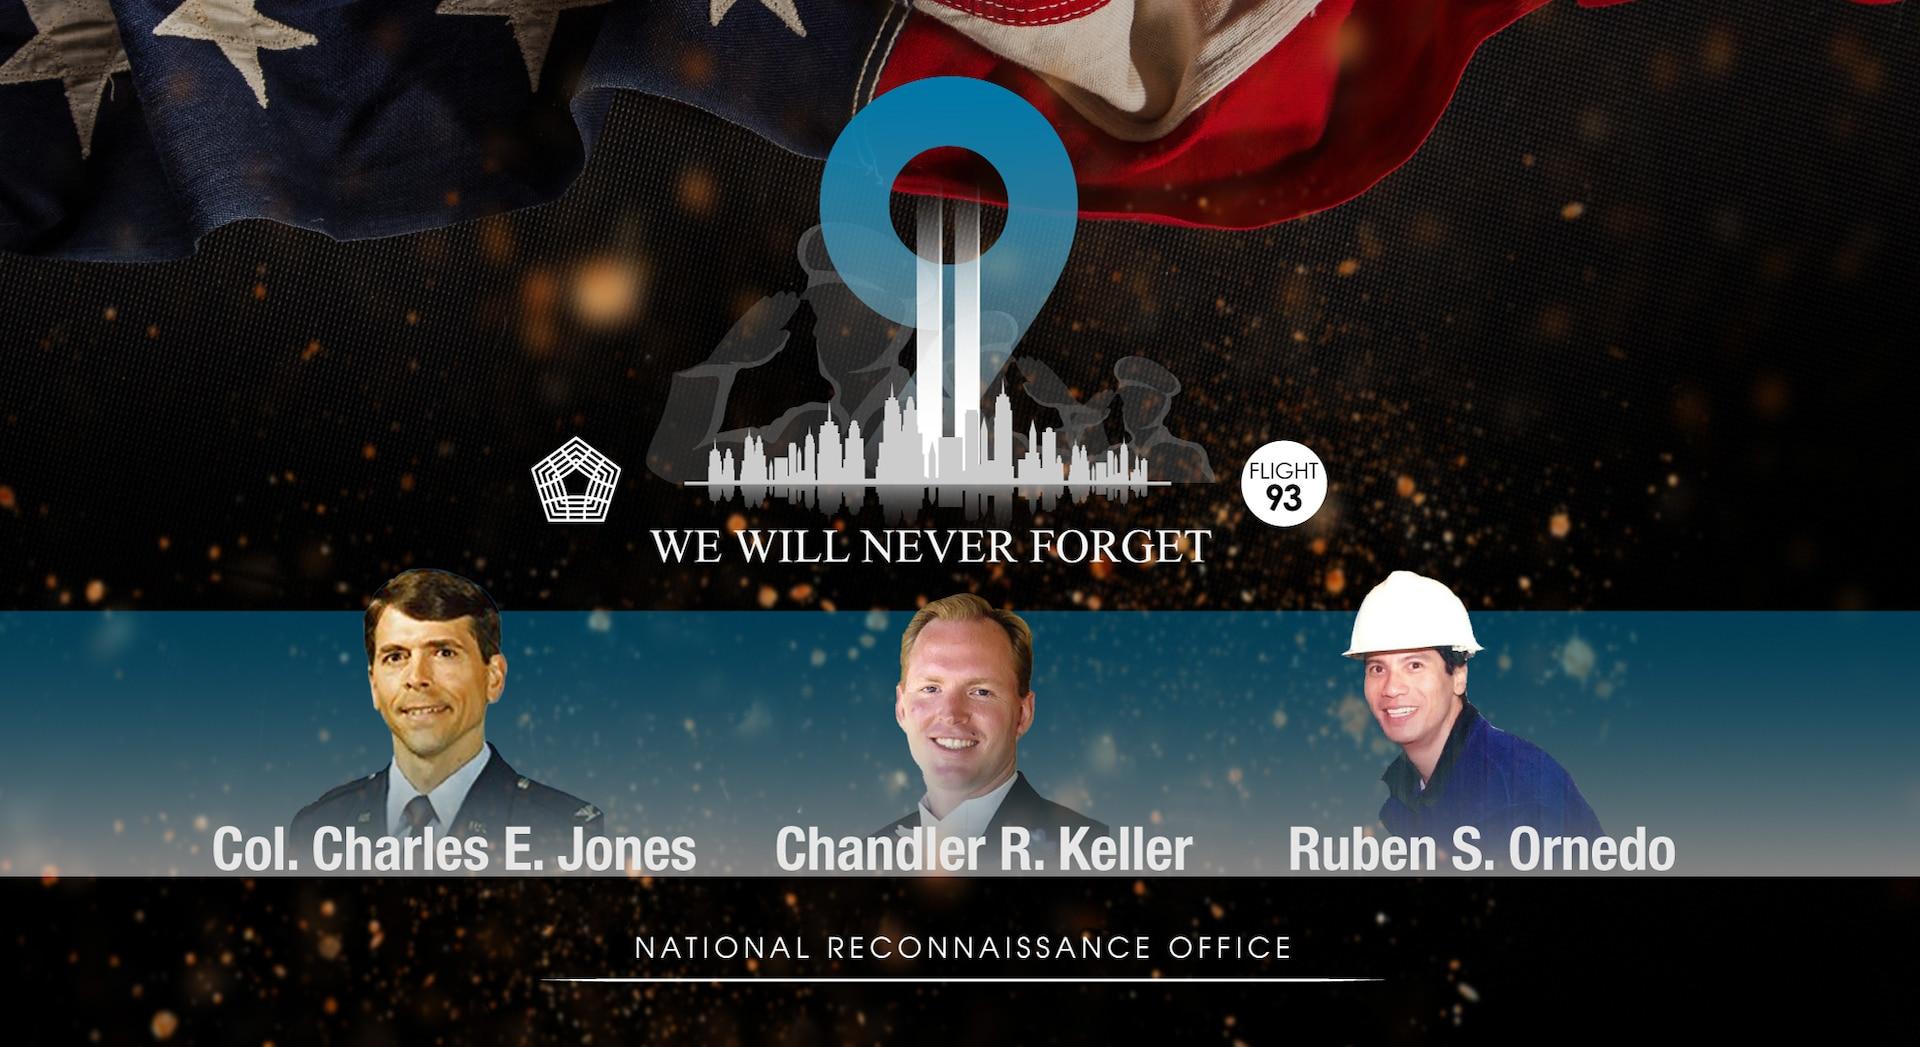 NRO remembers 911